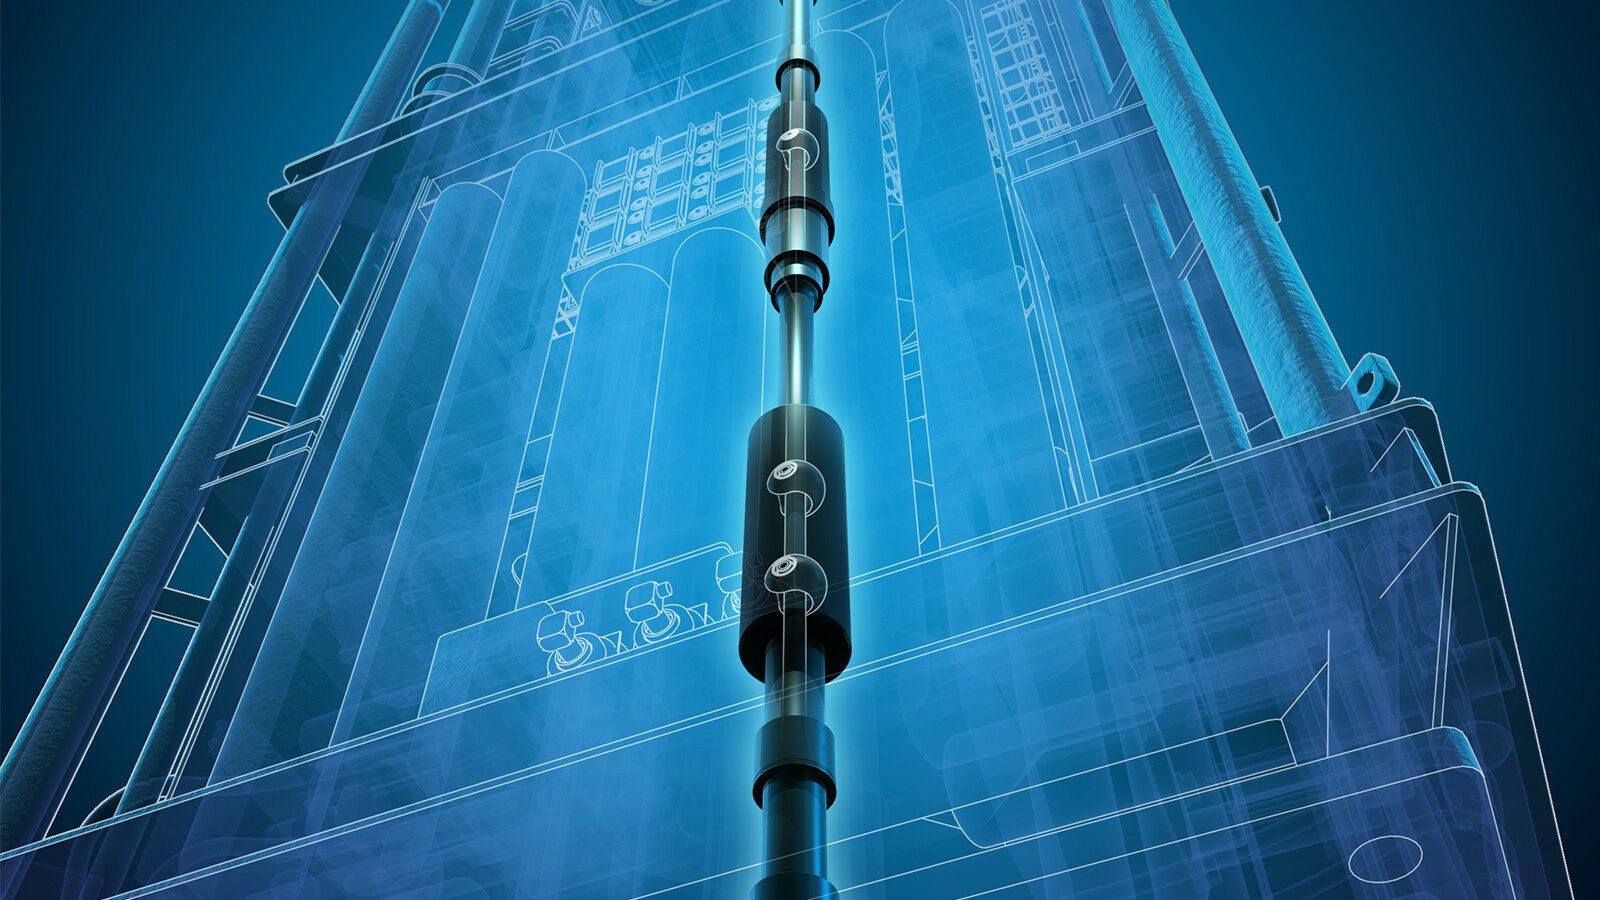 Veto™ Subsea Safety Tree